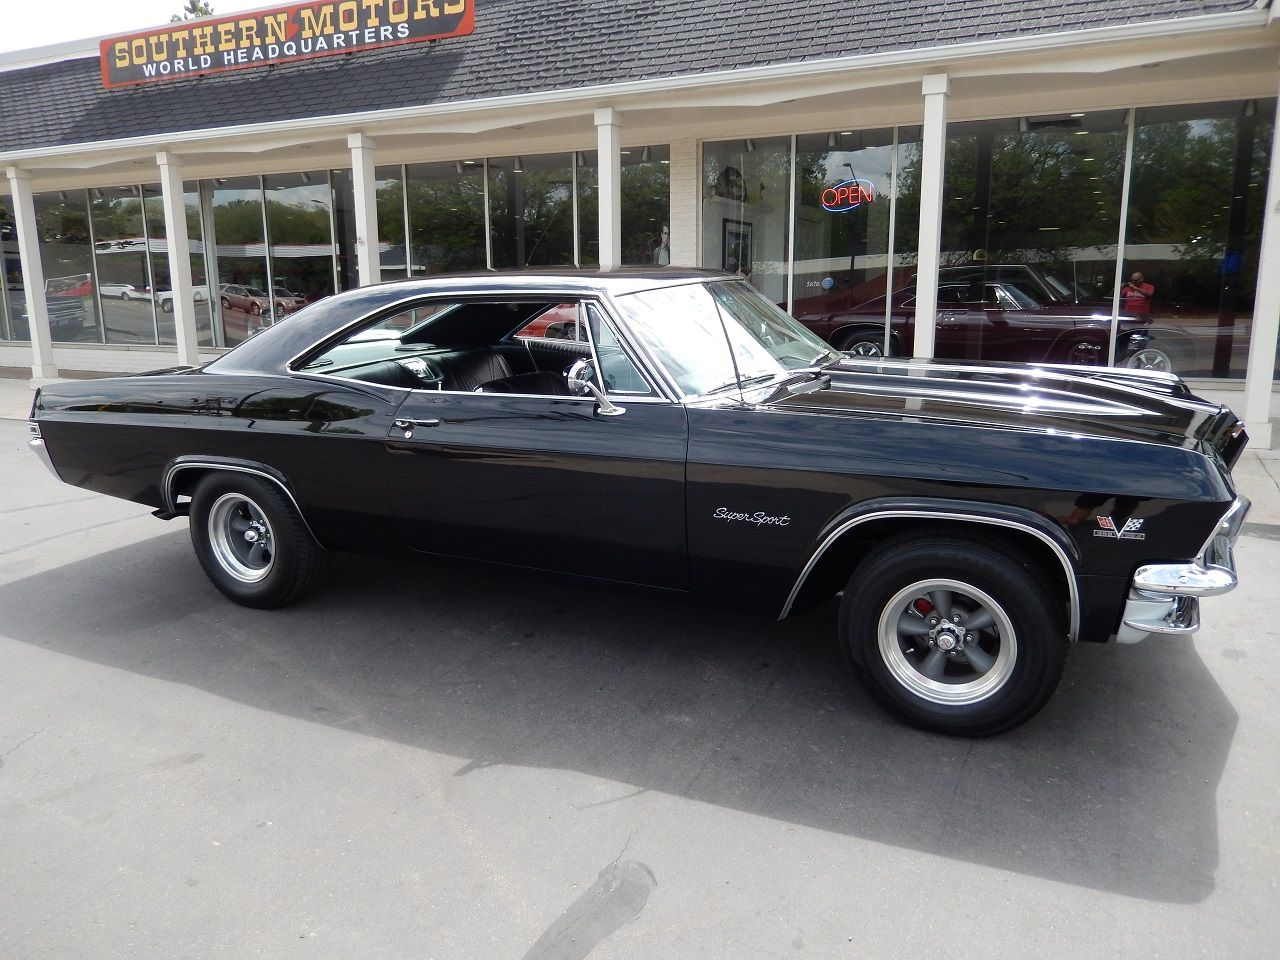 Southern motors 1965 chevrolet impala ss